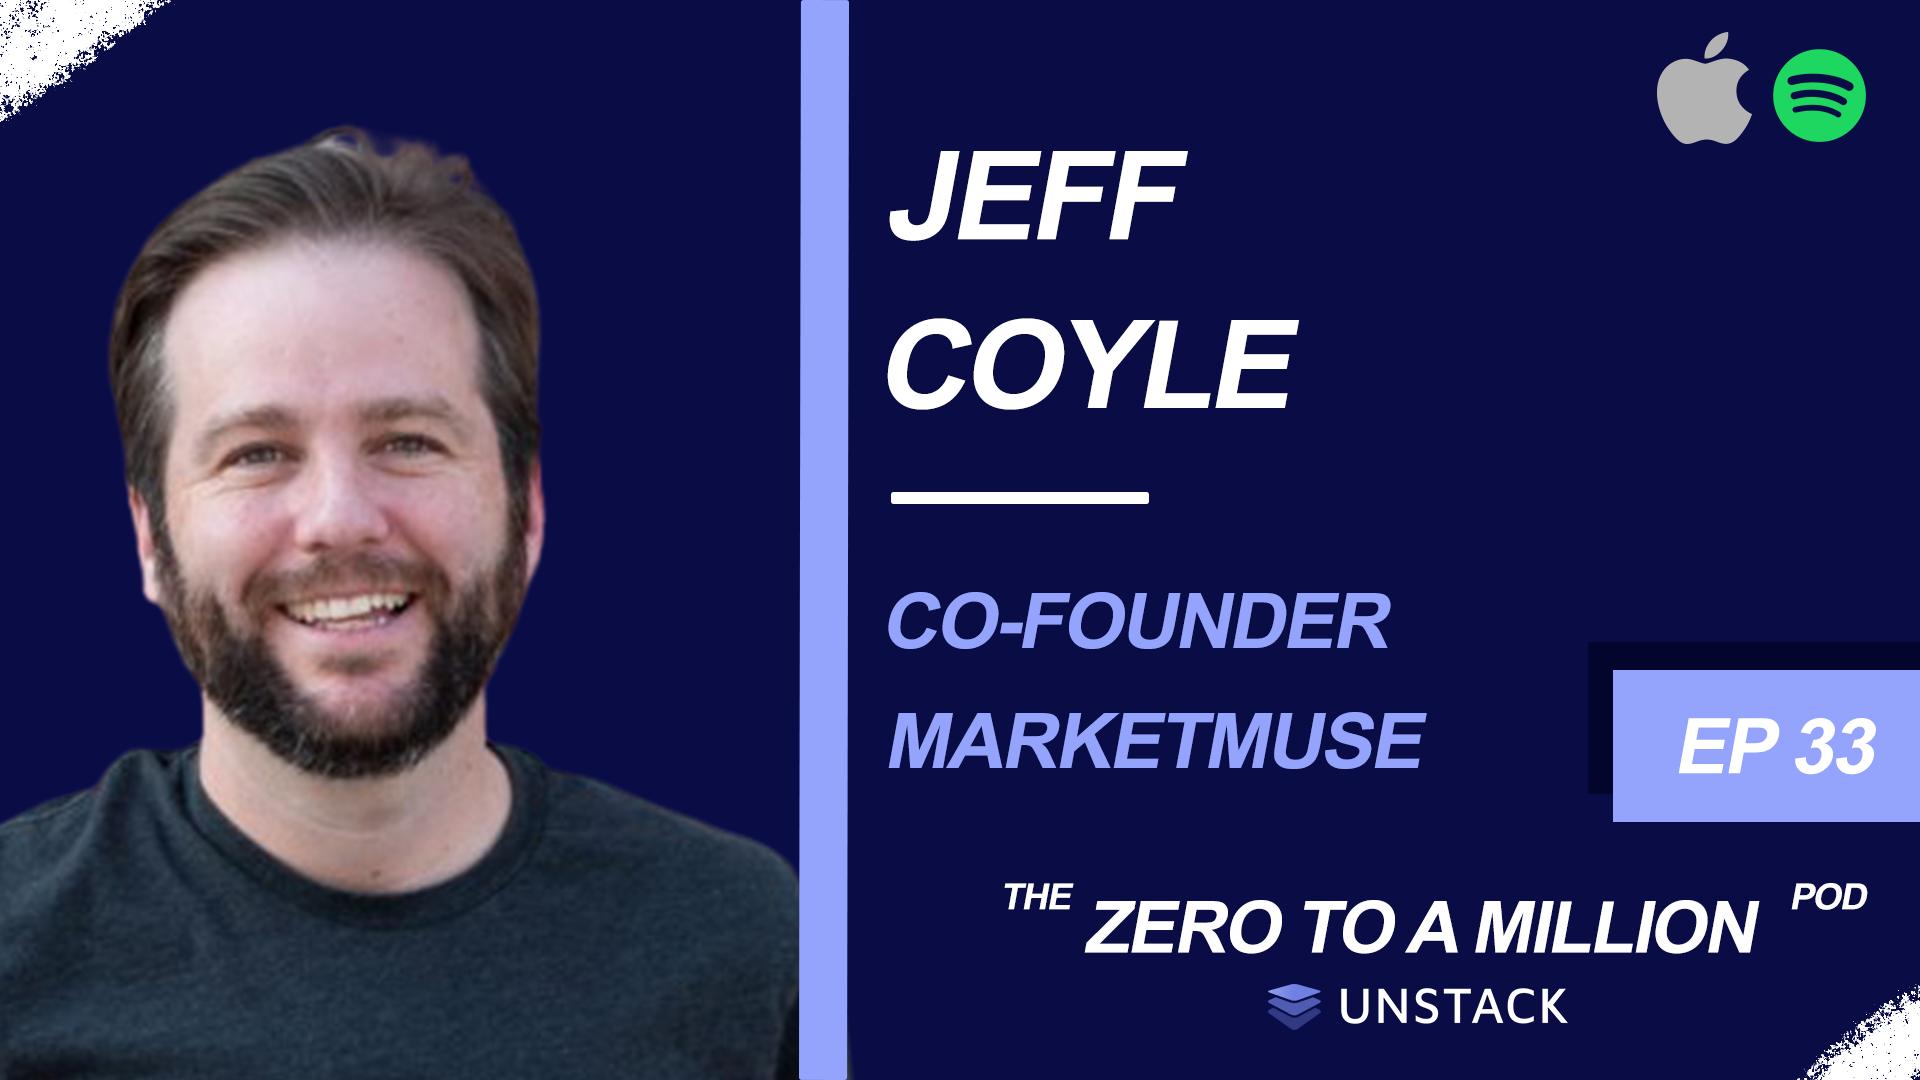 Zero to a Million, Episode 33: Jeff Coyle, MarketMuse